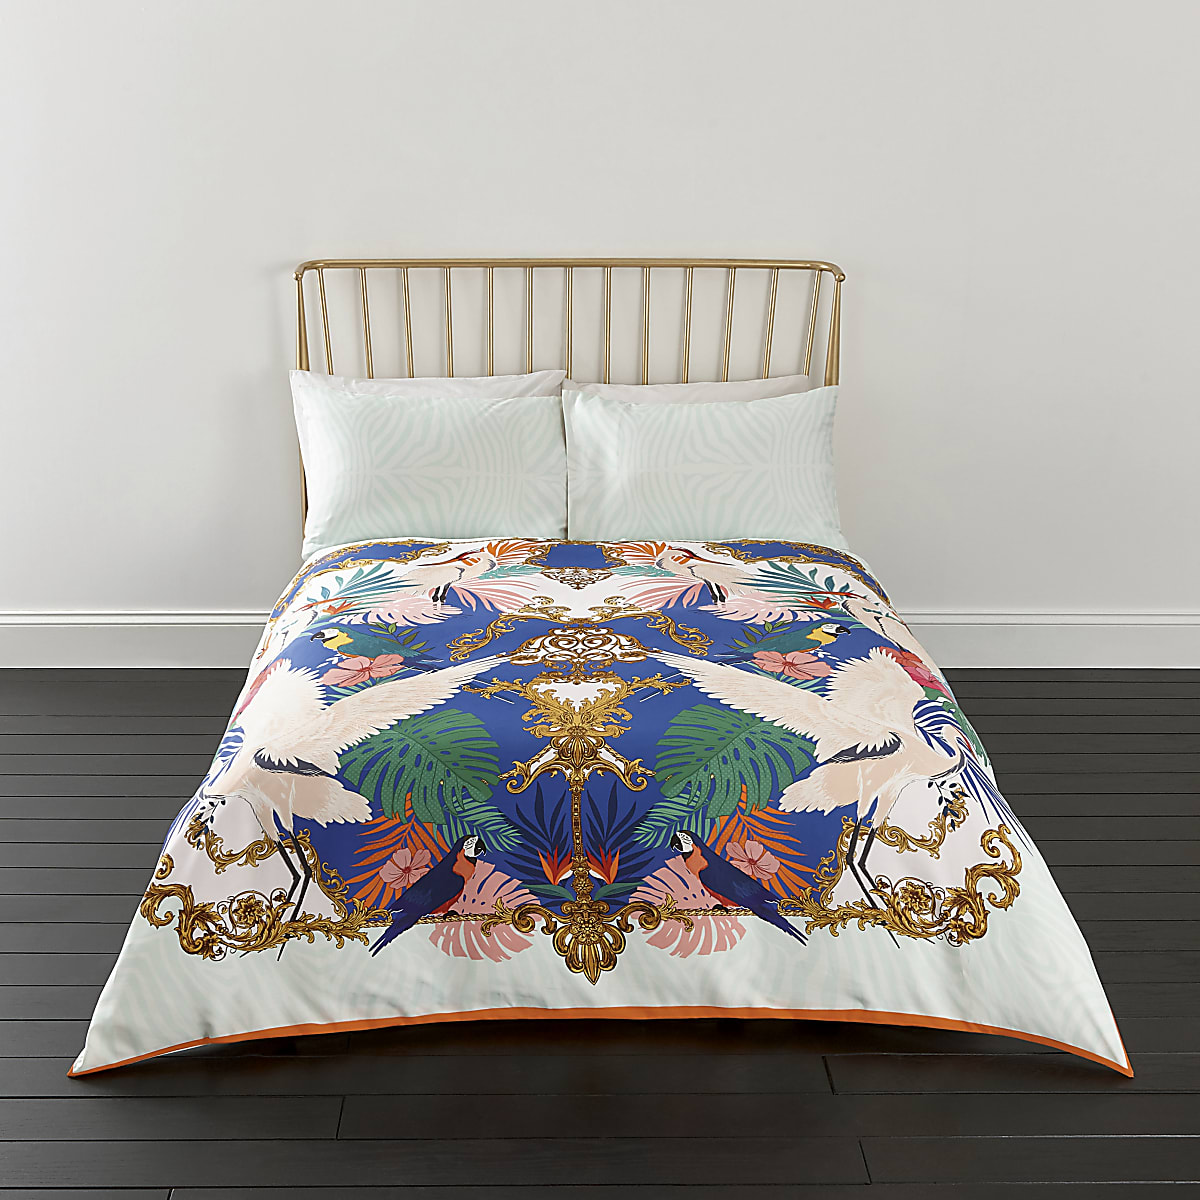 Roze kingsize dekbedset met Heron-print